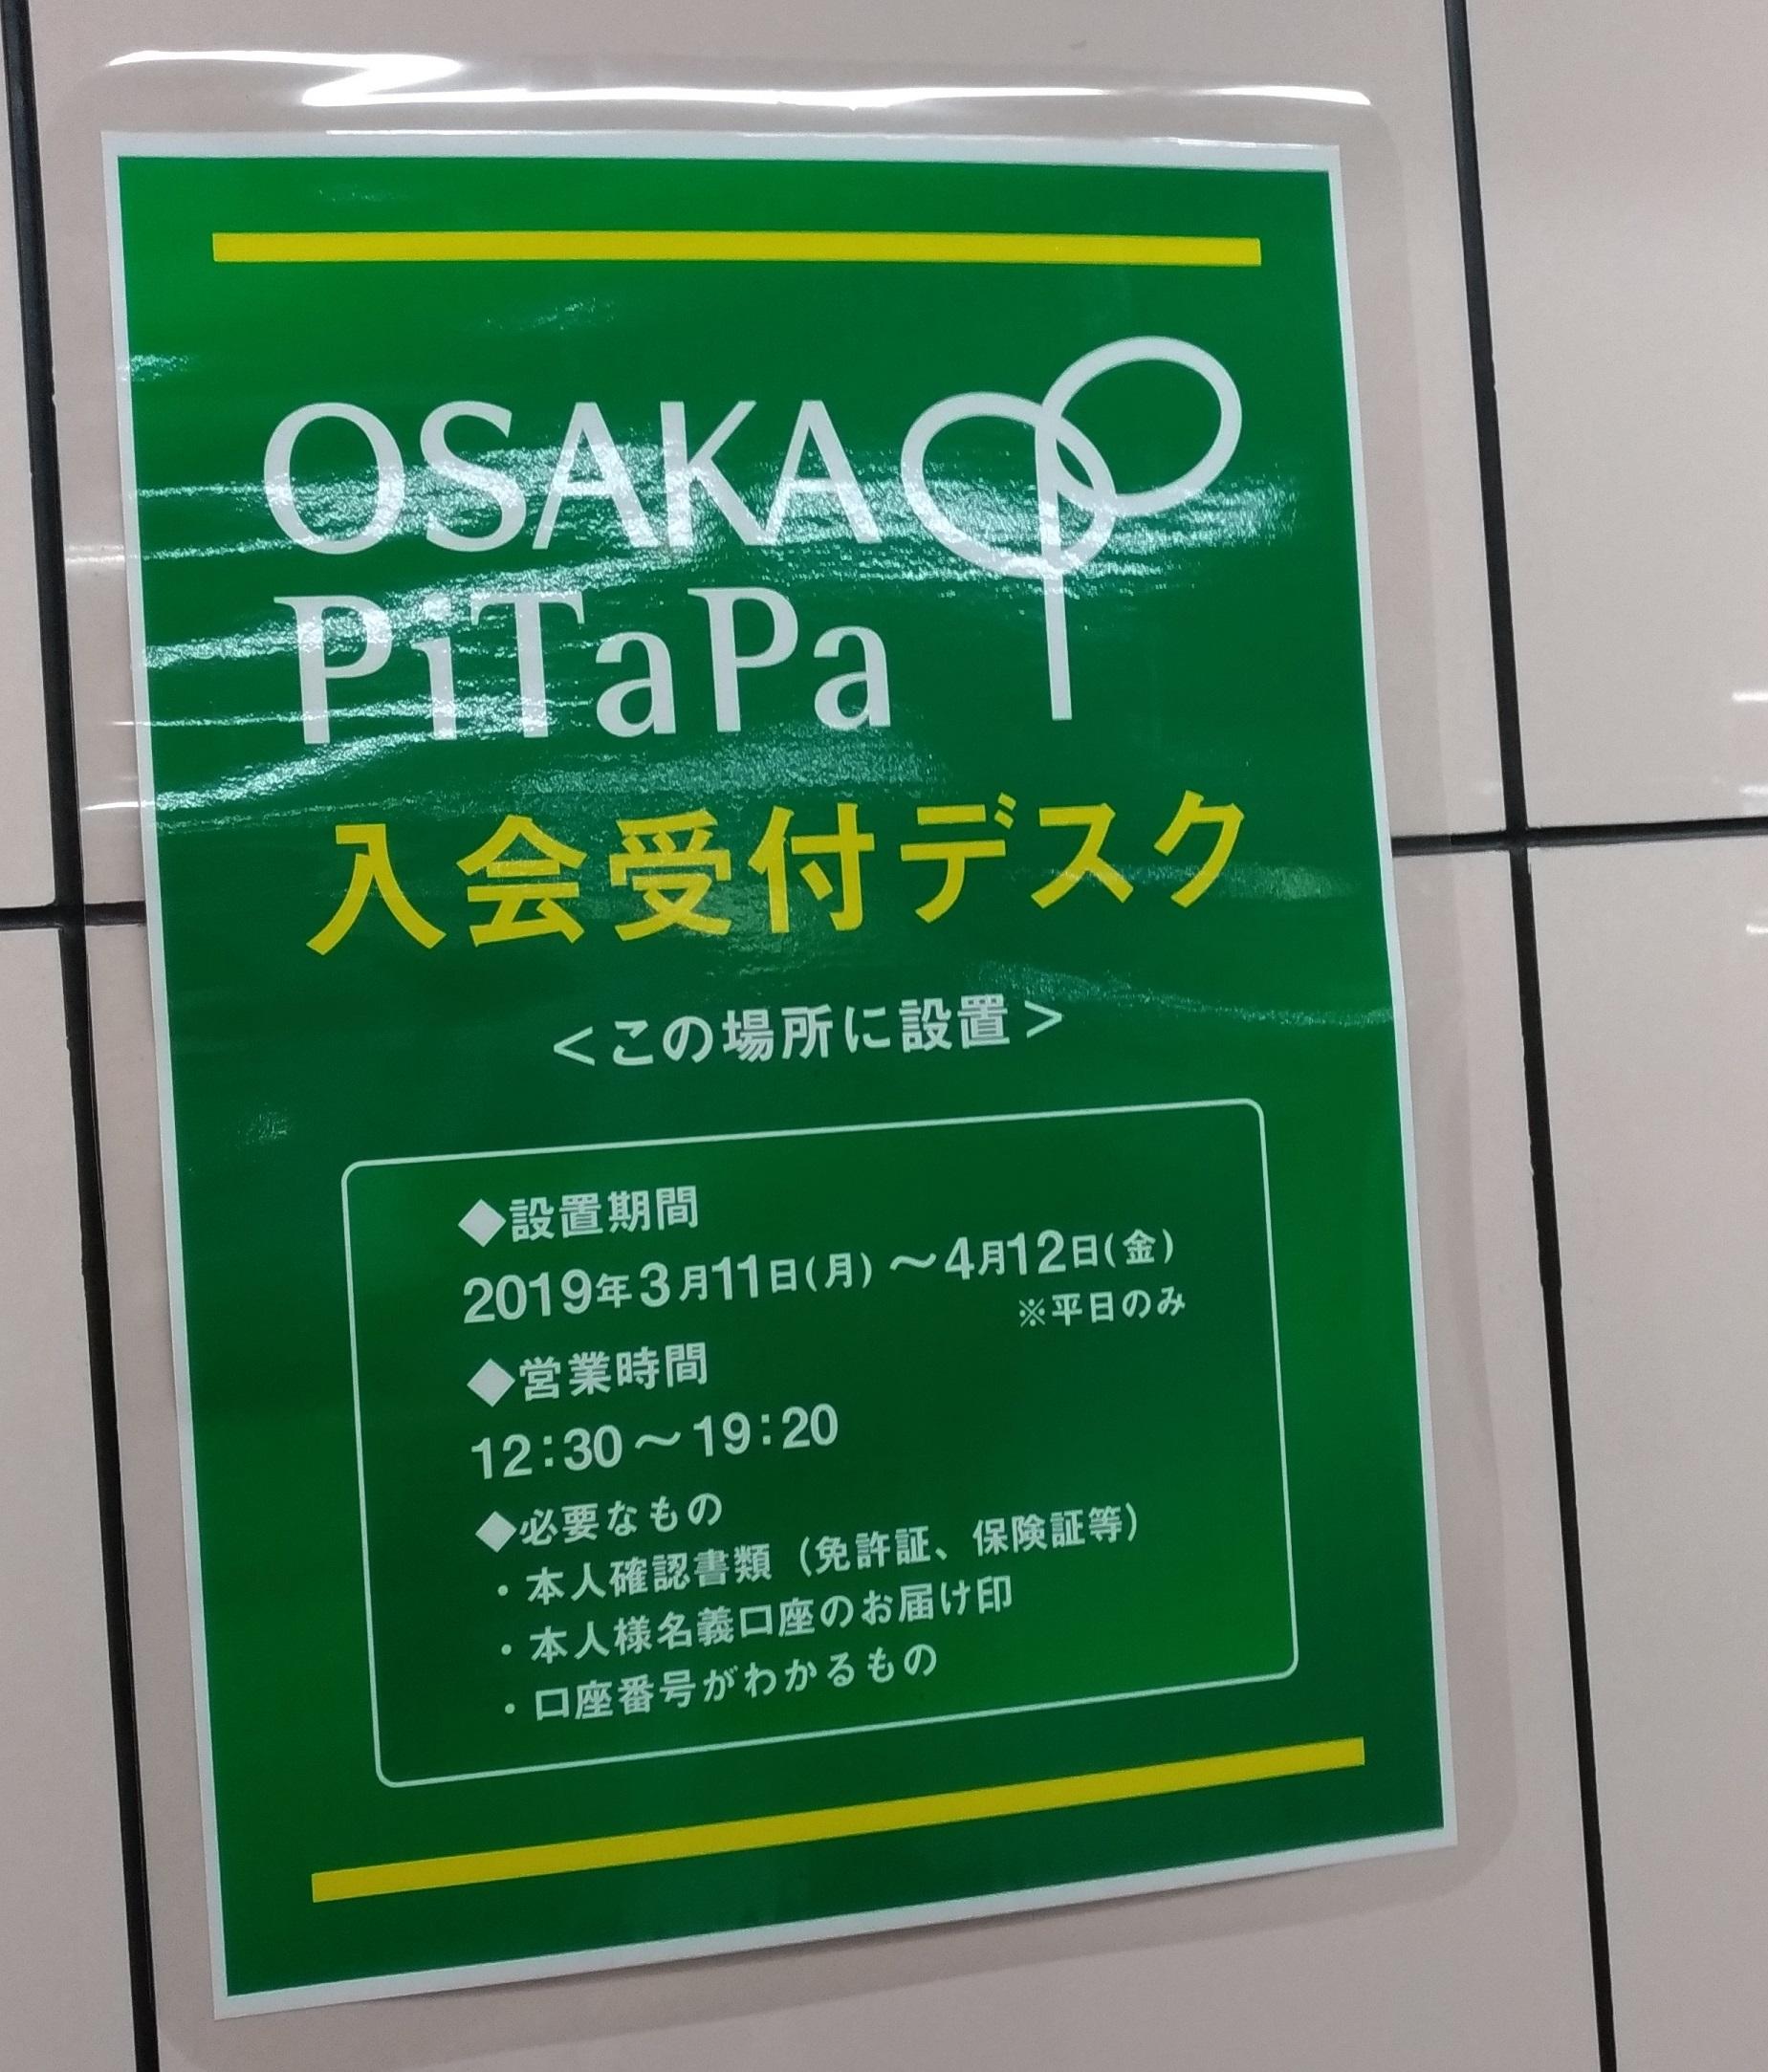 osaka_metro_pitapa_umeda.jpg